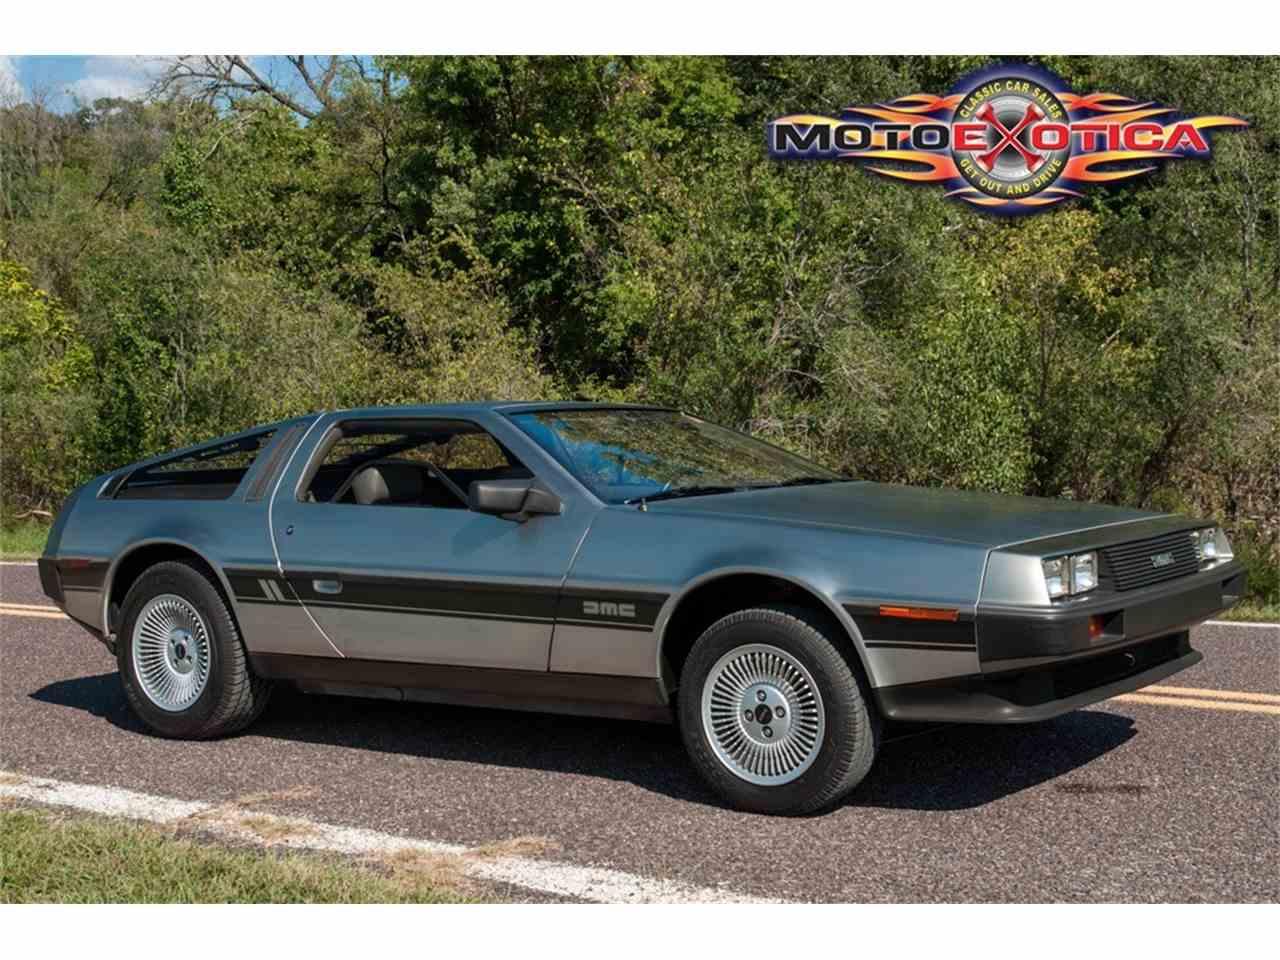 Large Picture of '81 DeLorean DMC-12 - $73,500.00 - JPXR